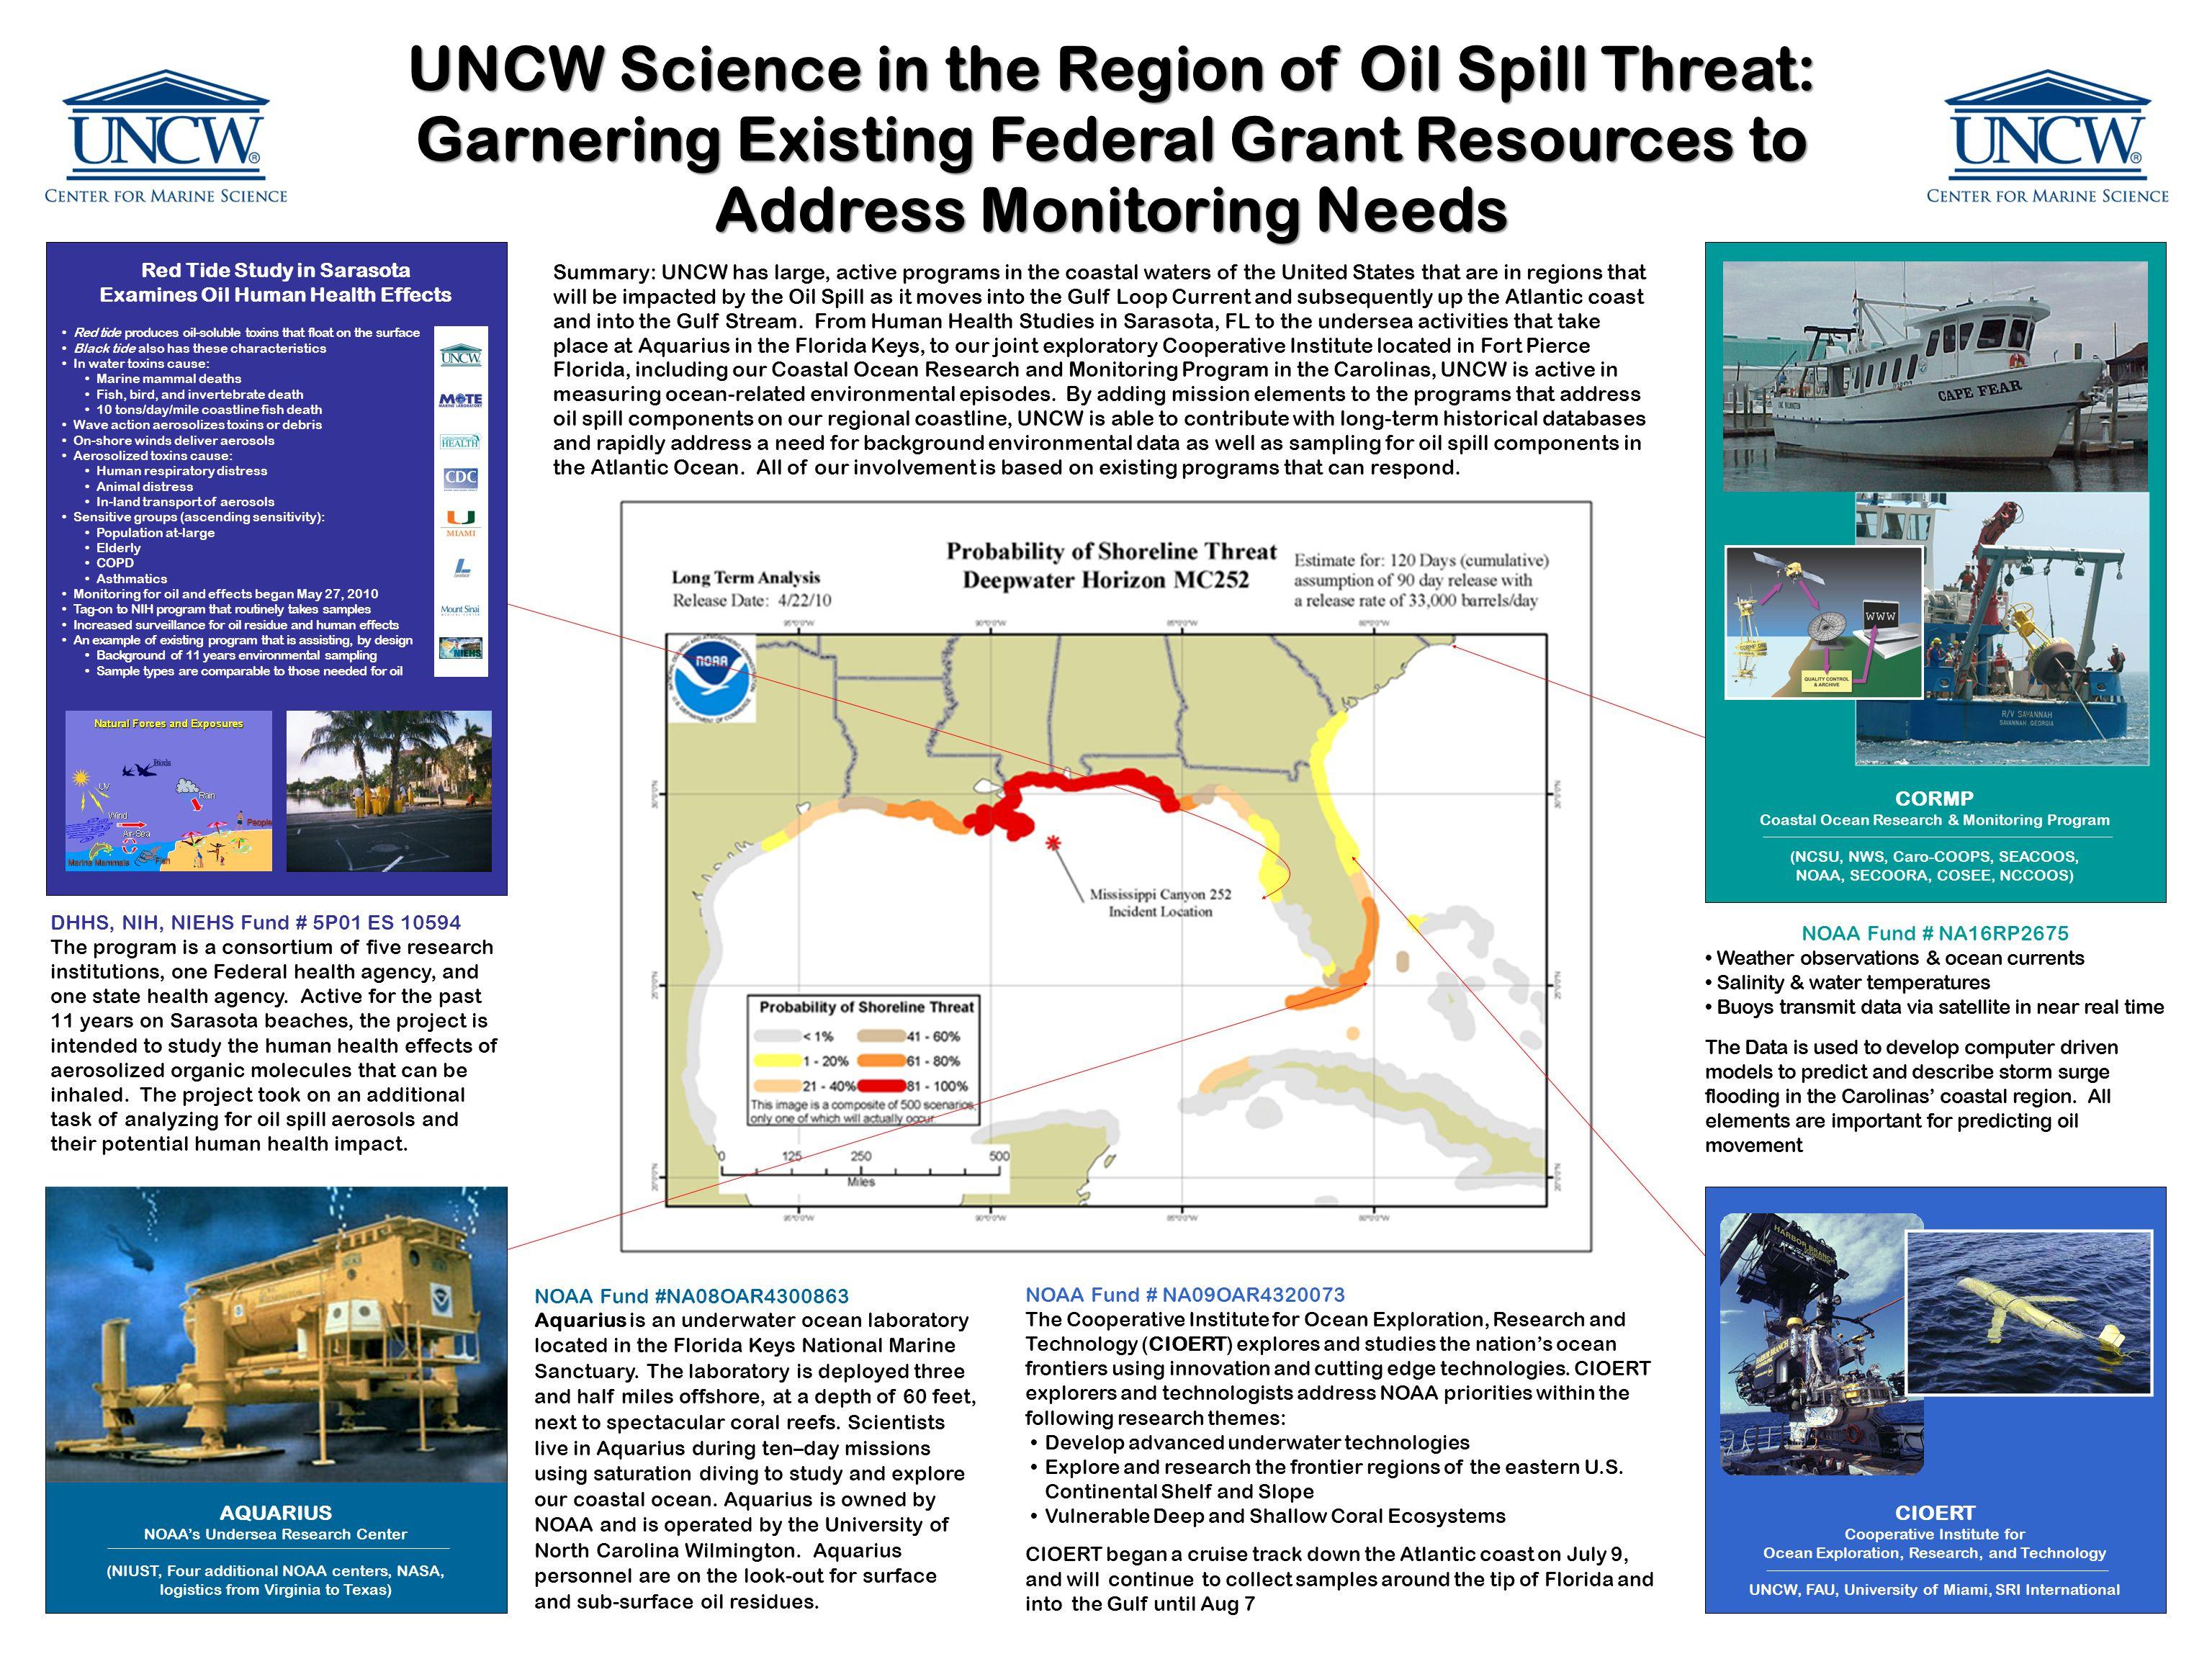 Red Tide Study in Sarasota Examines Oil Human Health Effects CORMP Coastal Ocean Research & Monitoring Program (NCSU, NWS, Caro-COOPS, SEACOOS, NOAA,